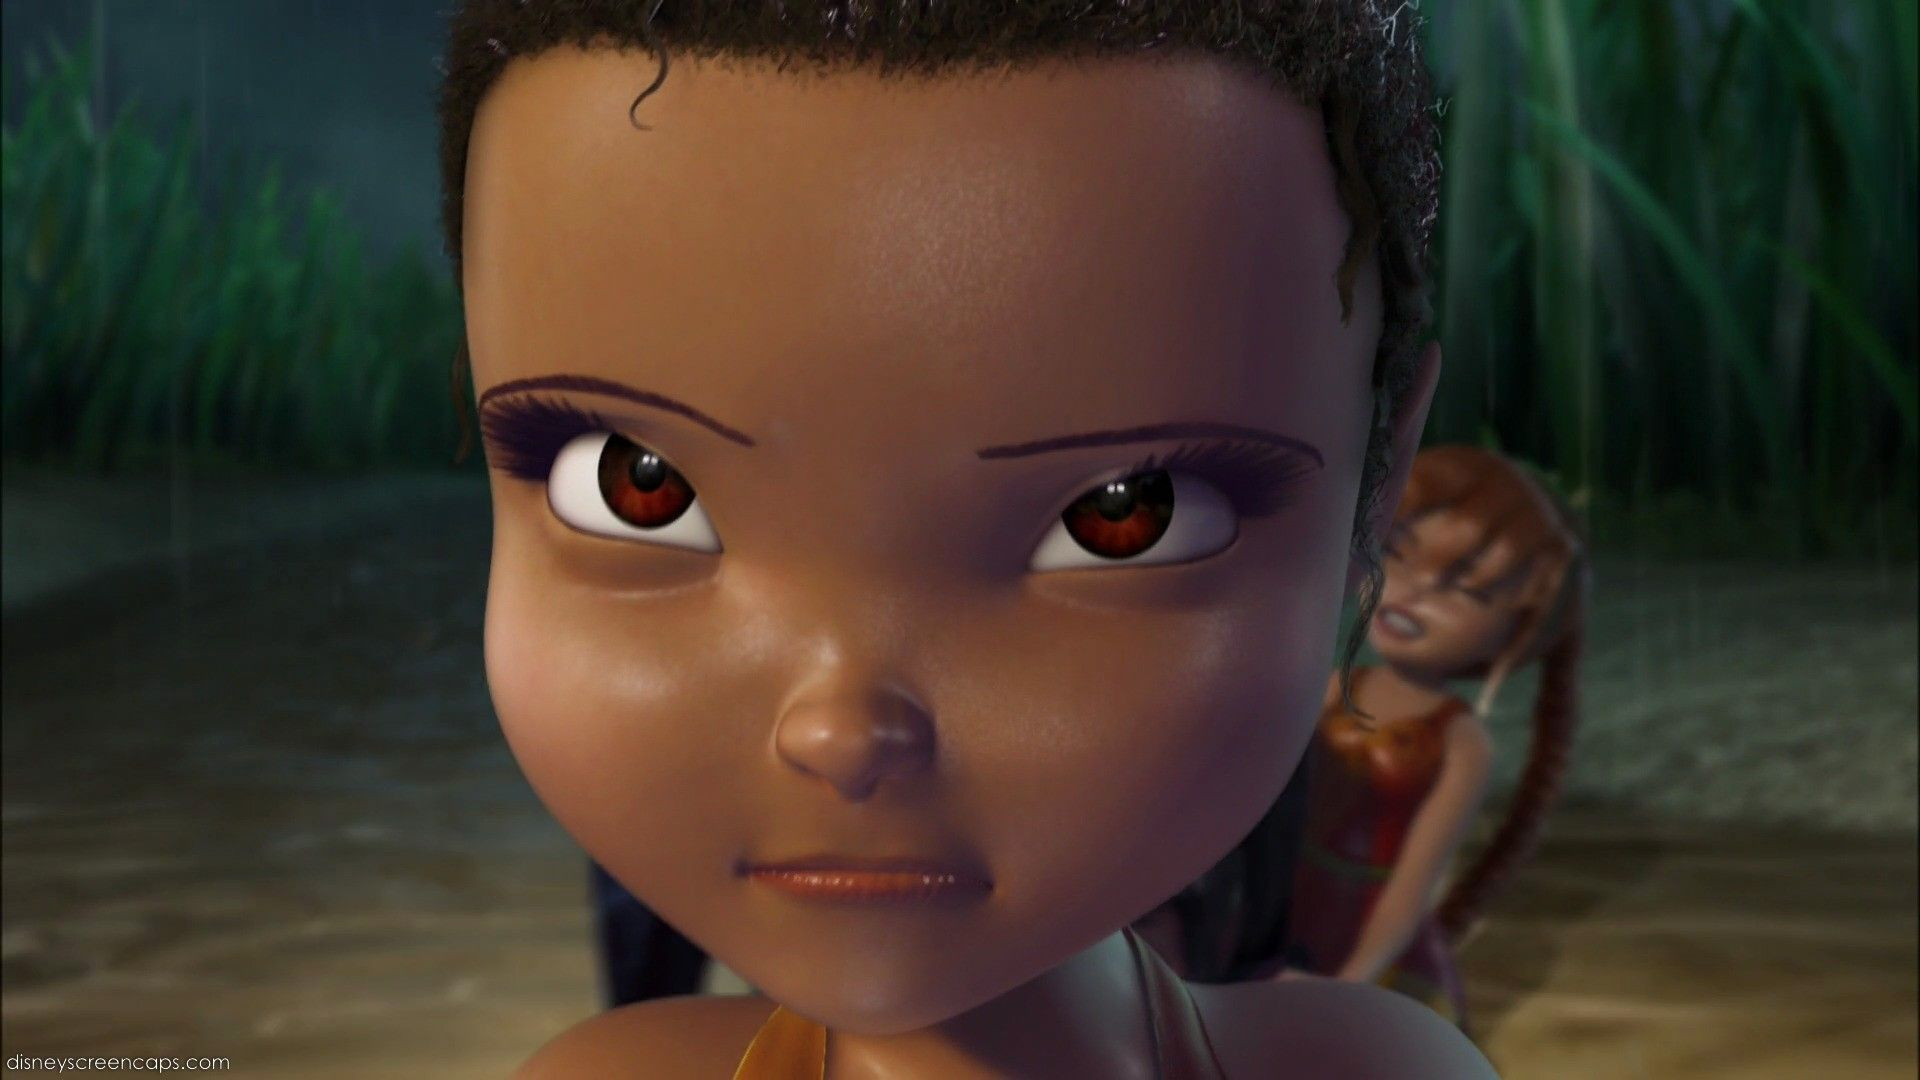 Hair color not hair style poll results disney princess fanpop - Disney Fairies